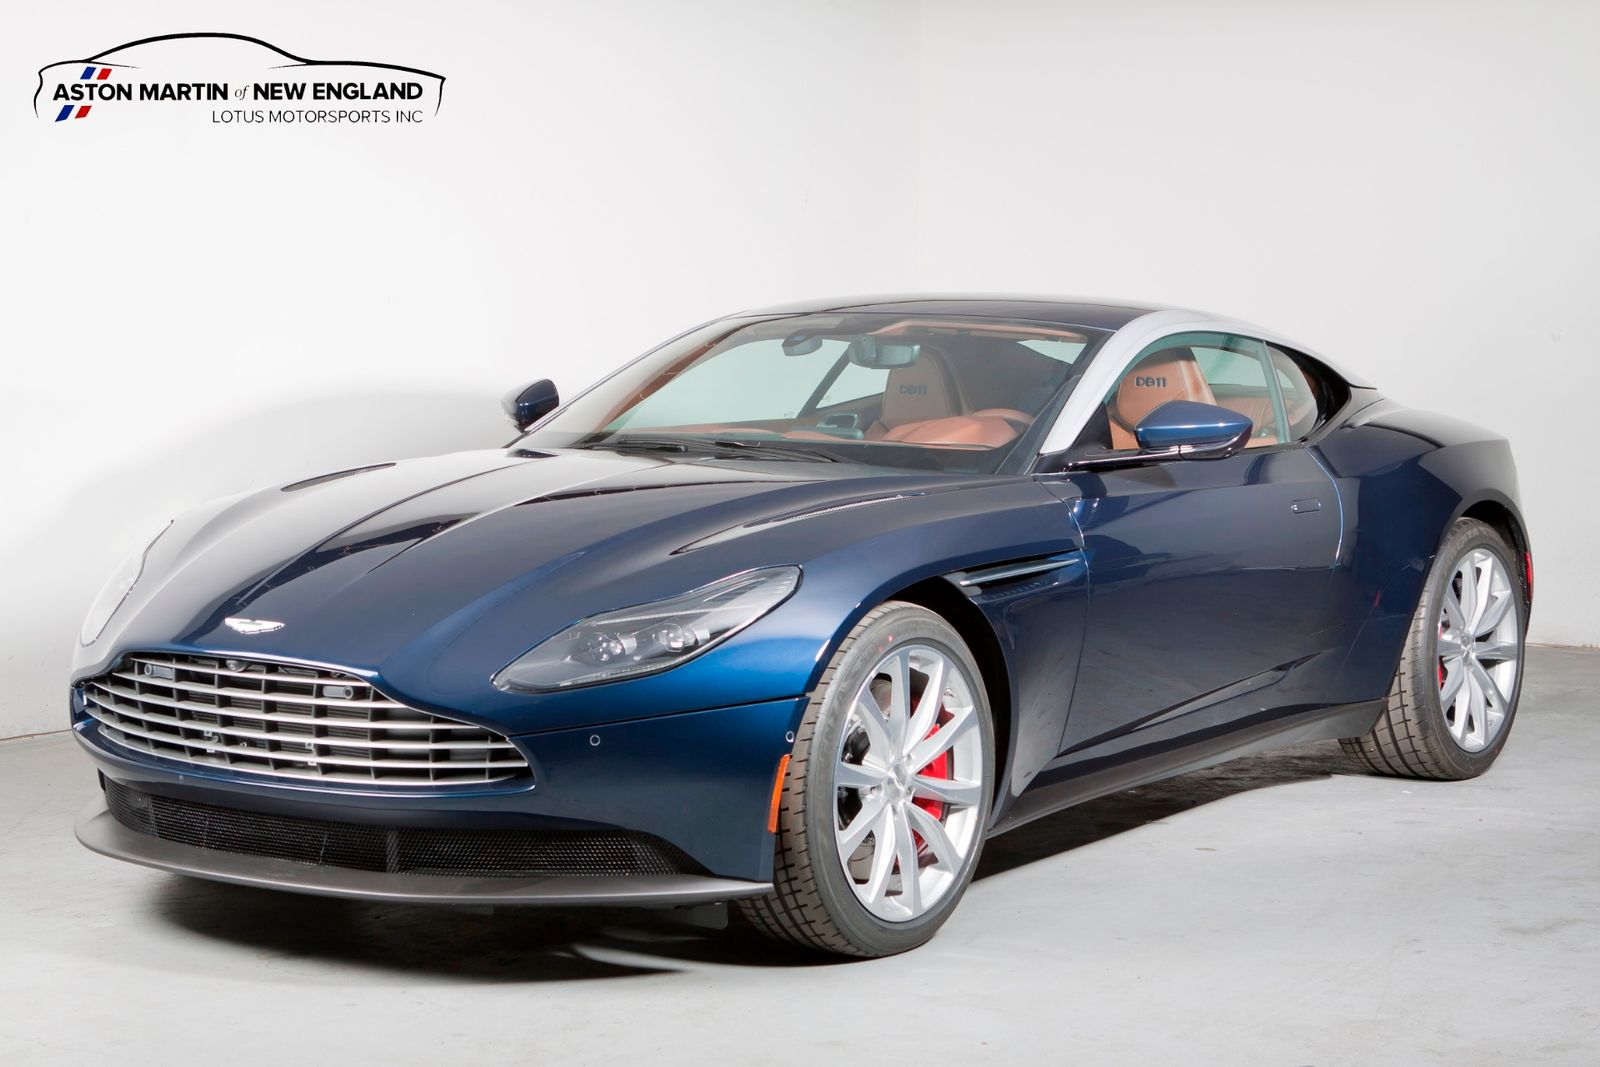 Aston Martin DB City MA Aston Martin Of New England - Aston martin new england